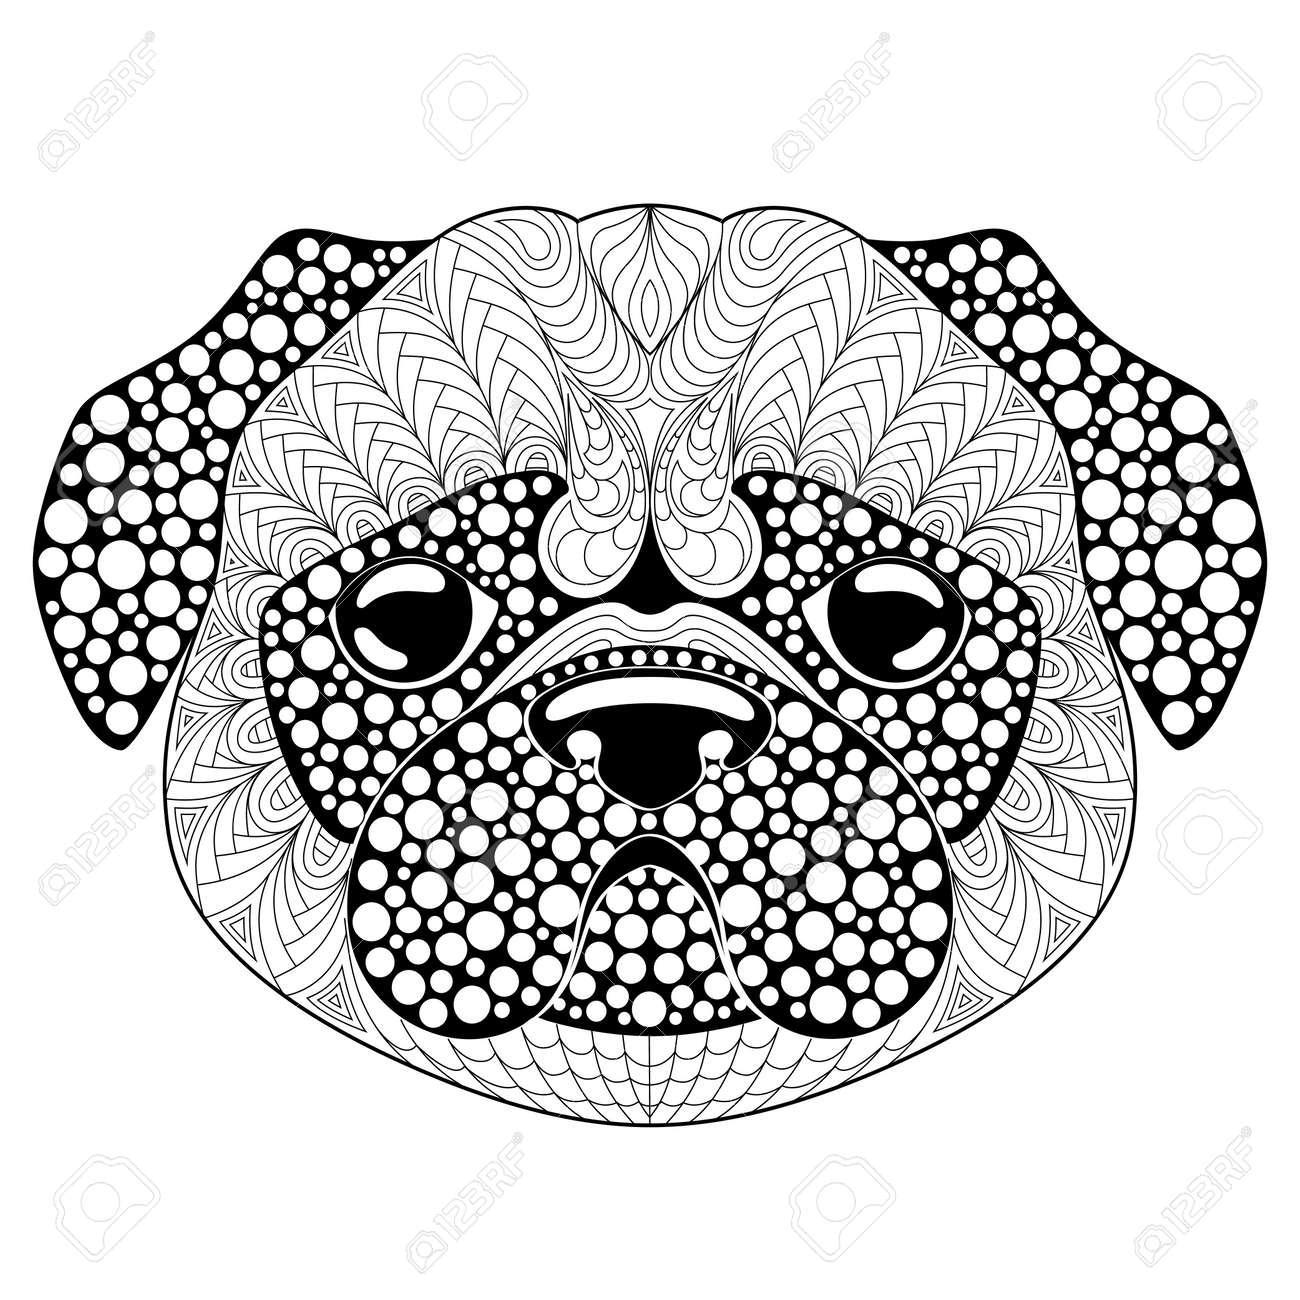 Cabeza De Perro Pug. Página Para Colorear De Tatuajes O Antiestrés ...